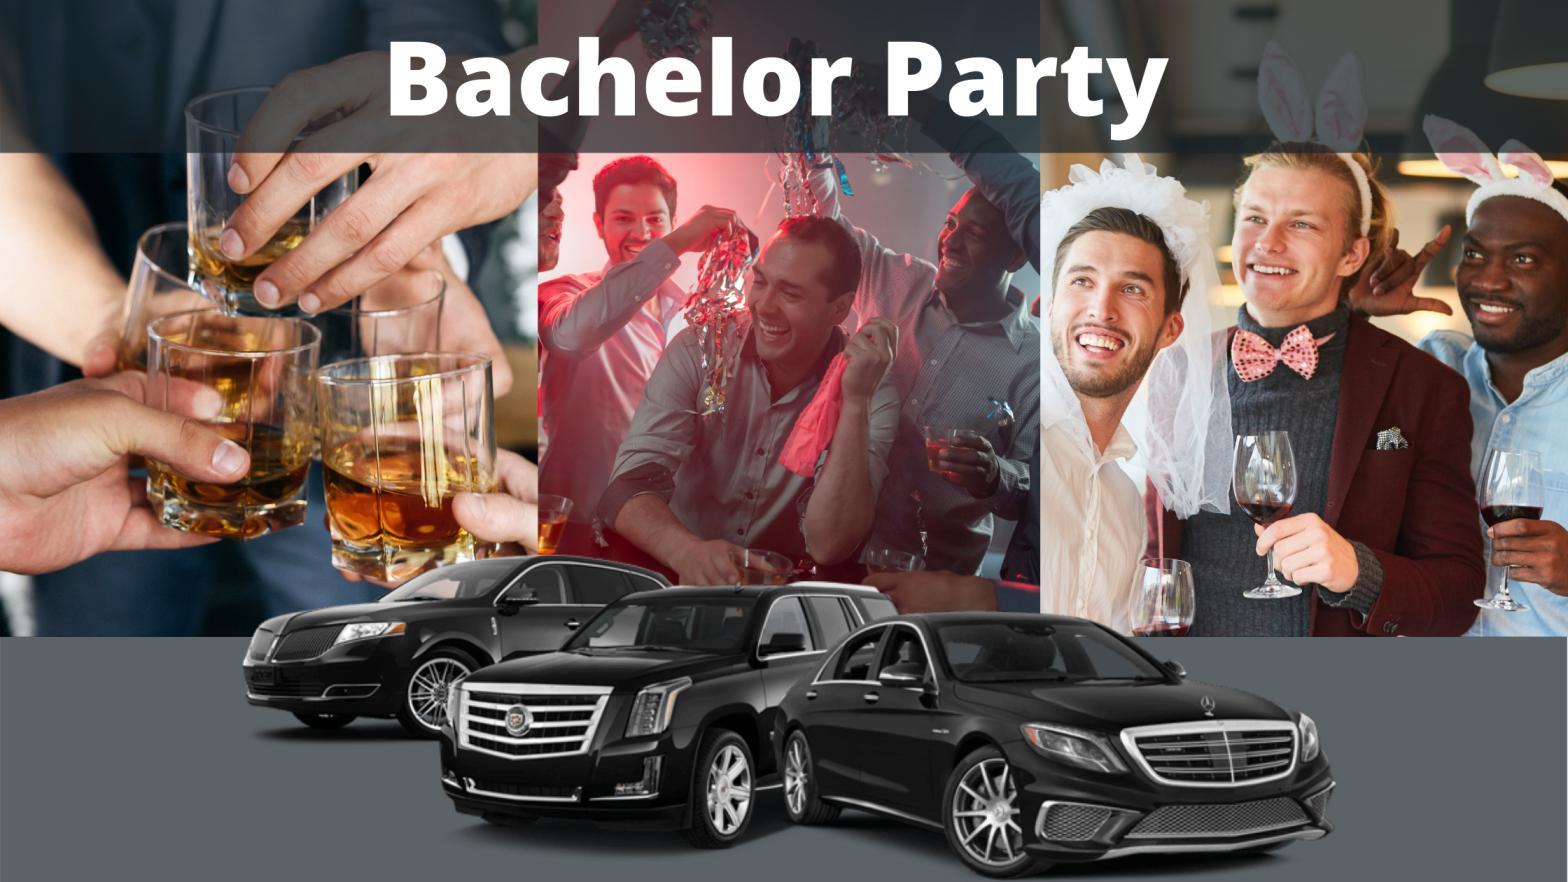 Hampton's bachelor party ideas